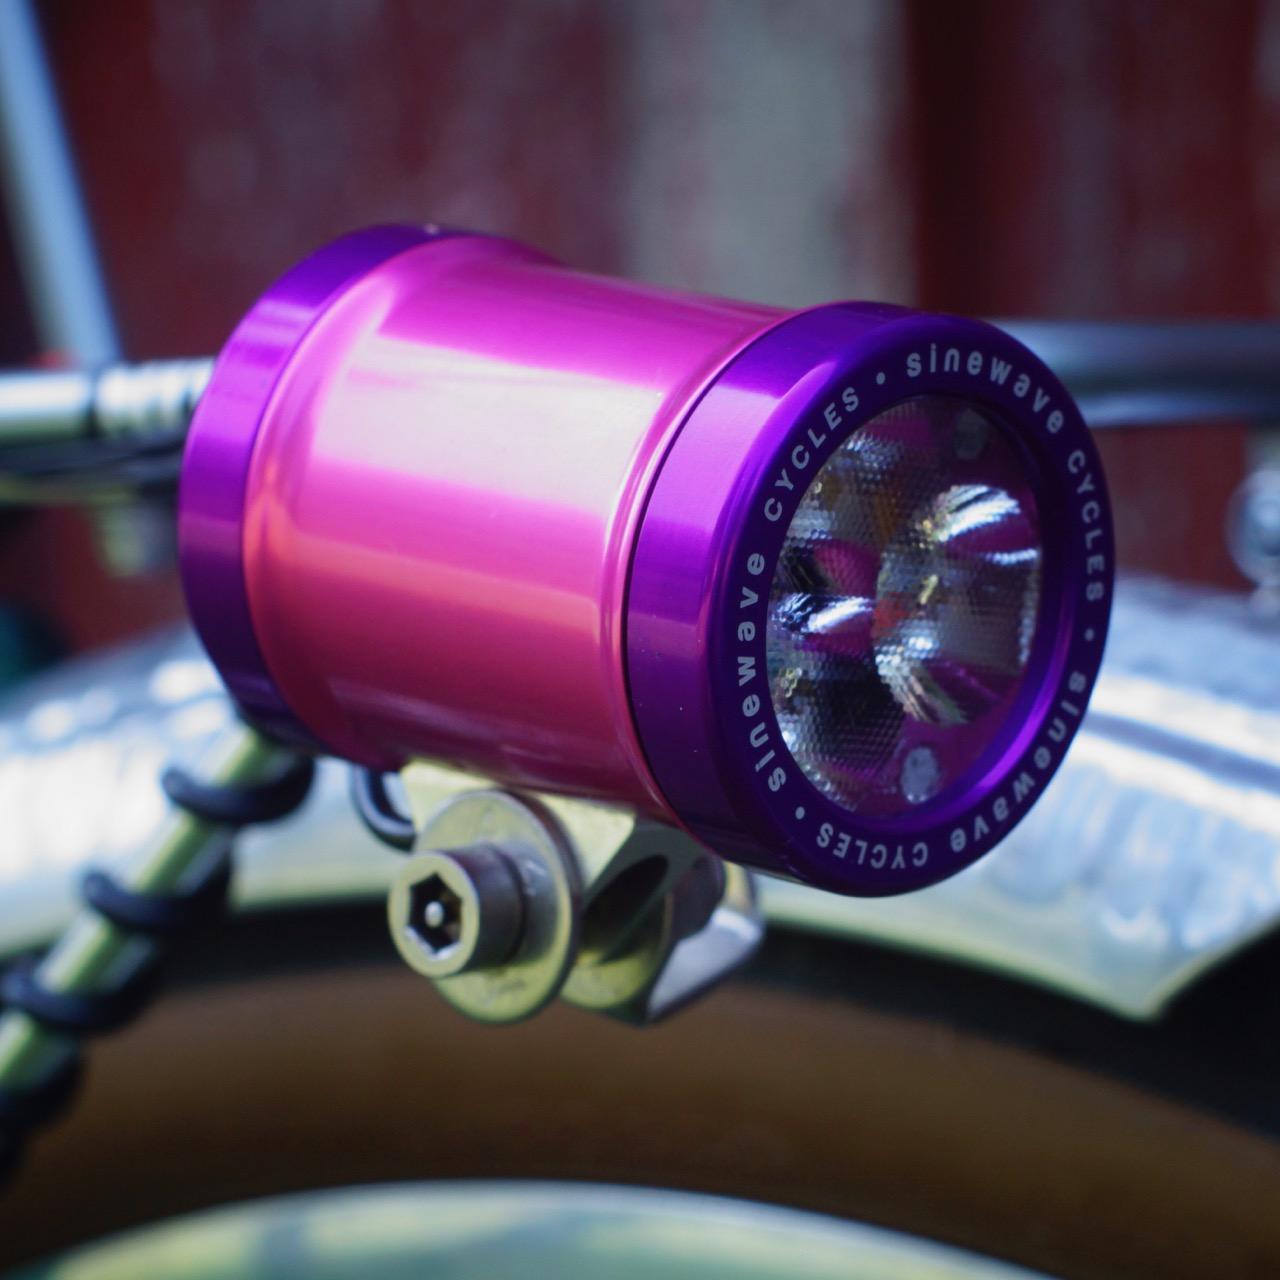 sinewave beacon rose et violet mix and match